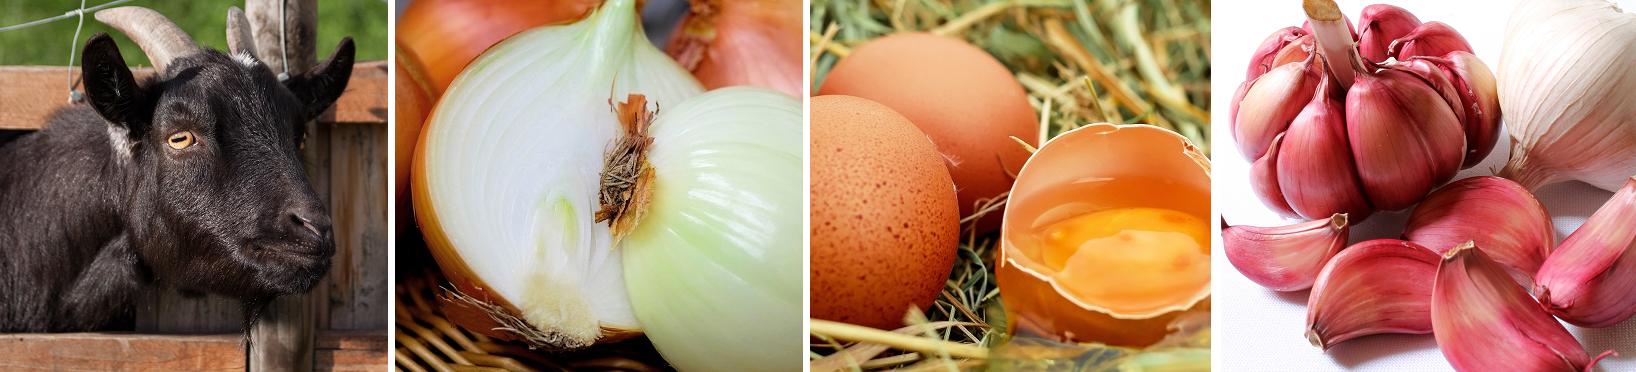 Billy goat, onion, rotten egg, garlic